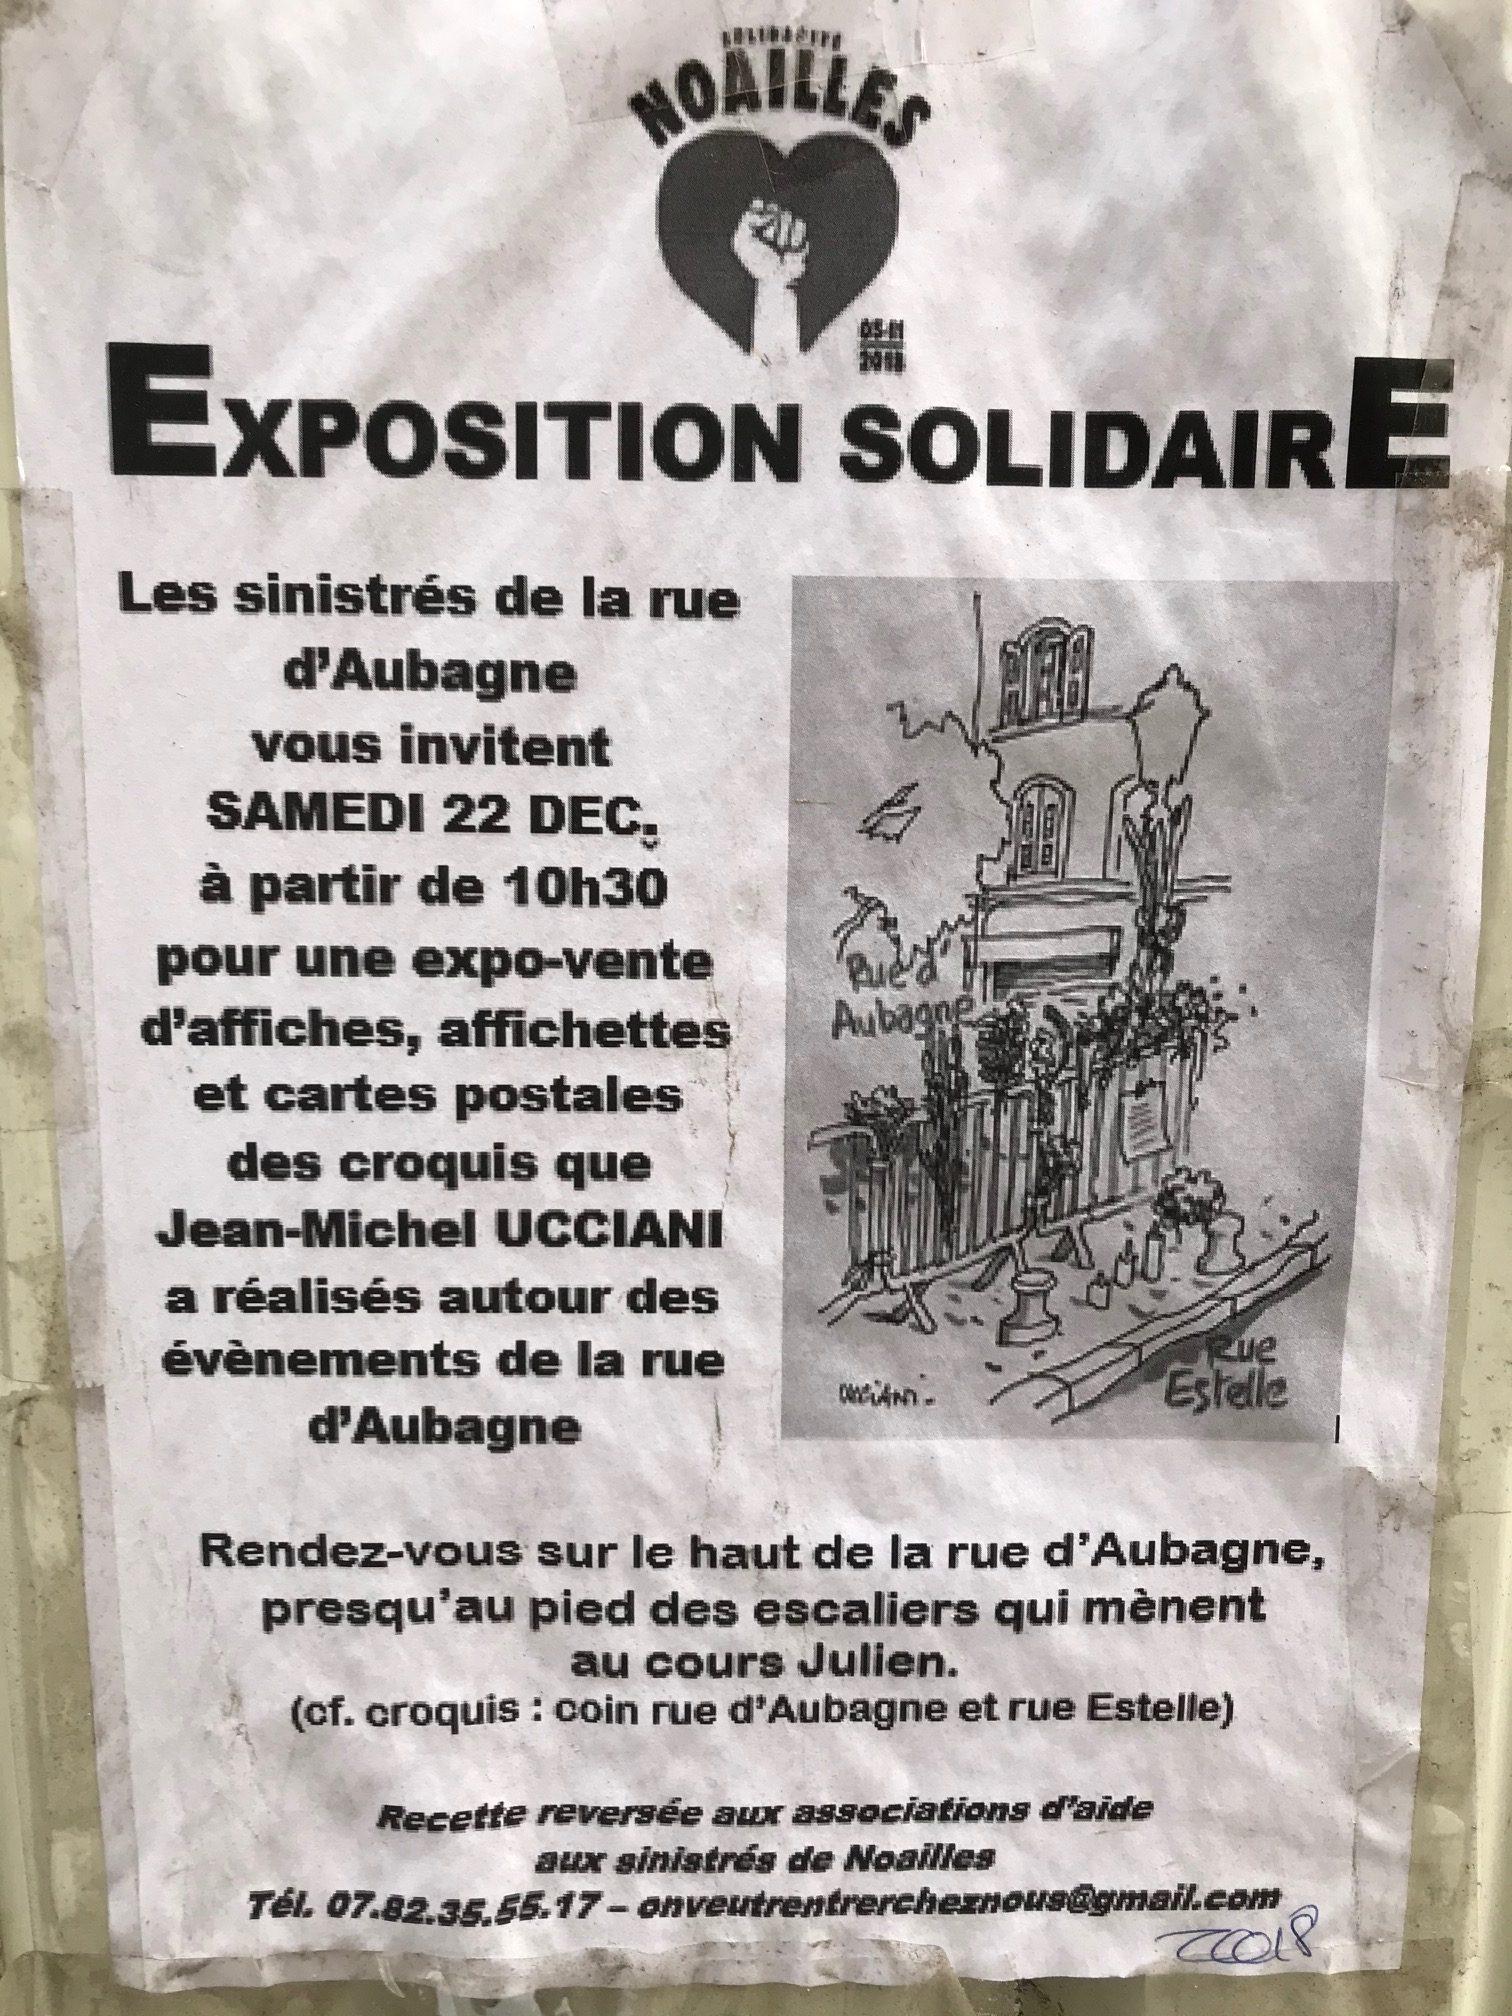 Expo solidaire 22dec18